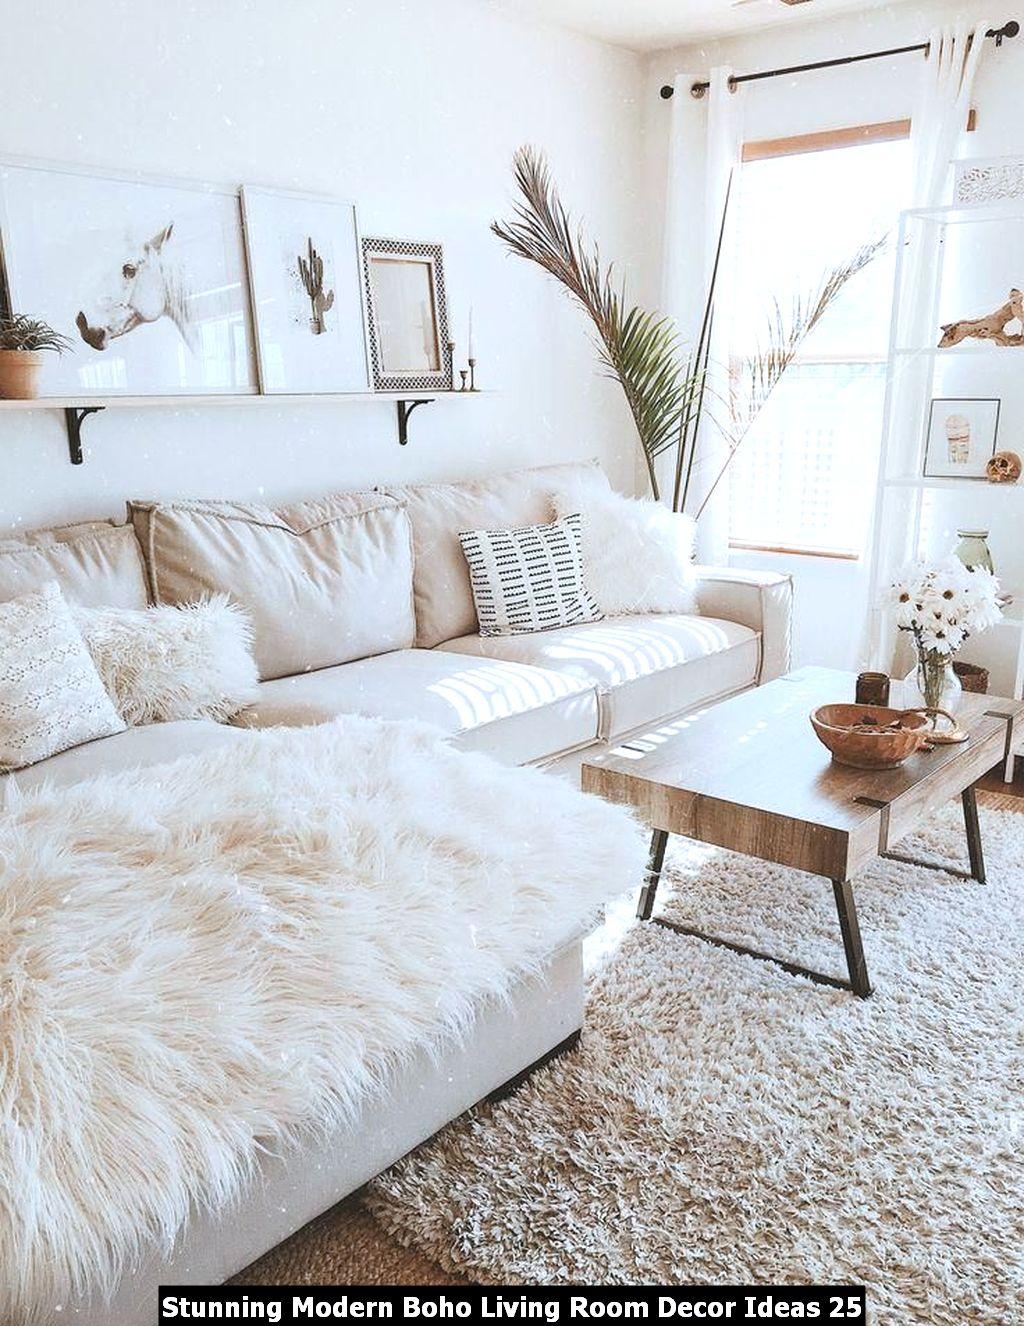 Stunning Modern Boho Living Room Decor Ideas 25